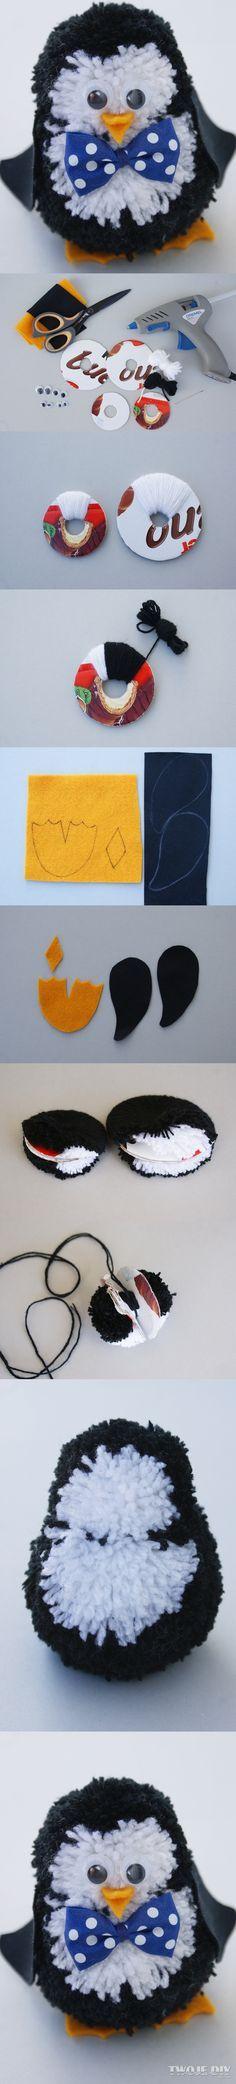 Pinguin met pompoms